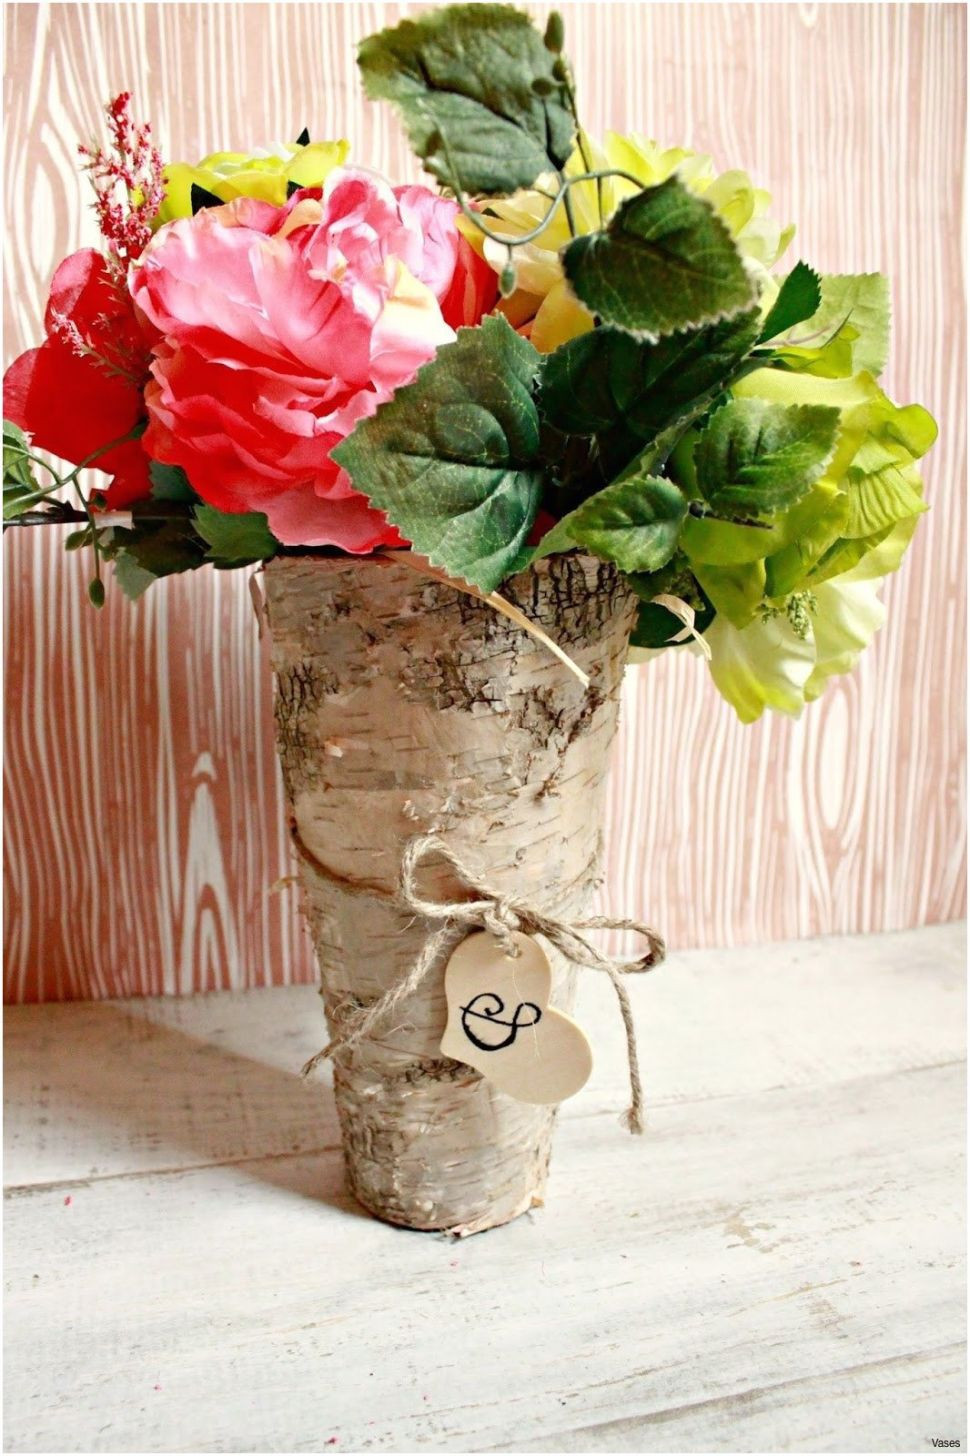 vase with pink roses van gogh of 10 awesome small flower vase online bogekompresorturkiye com throughout silk flower depot outstanding silk flower depot flower arrangements elegant floral arrangements 0d 1066 99